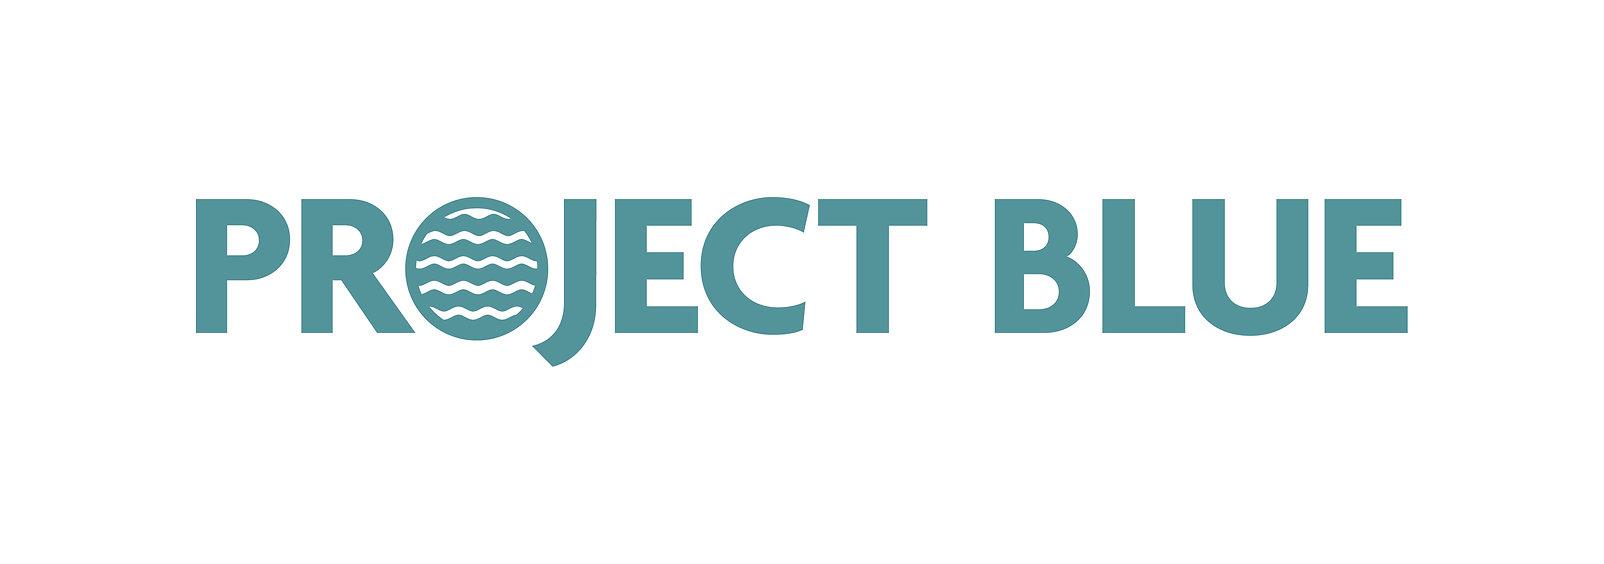 project blue logo